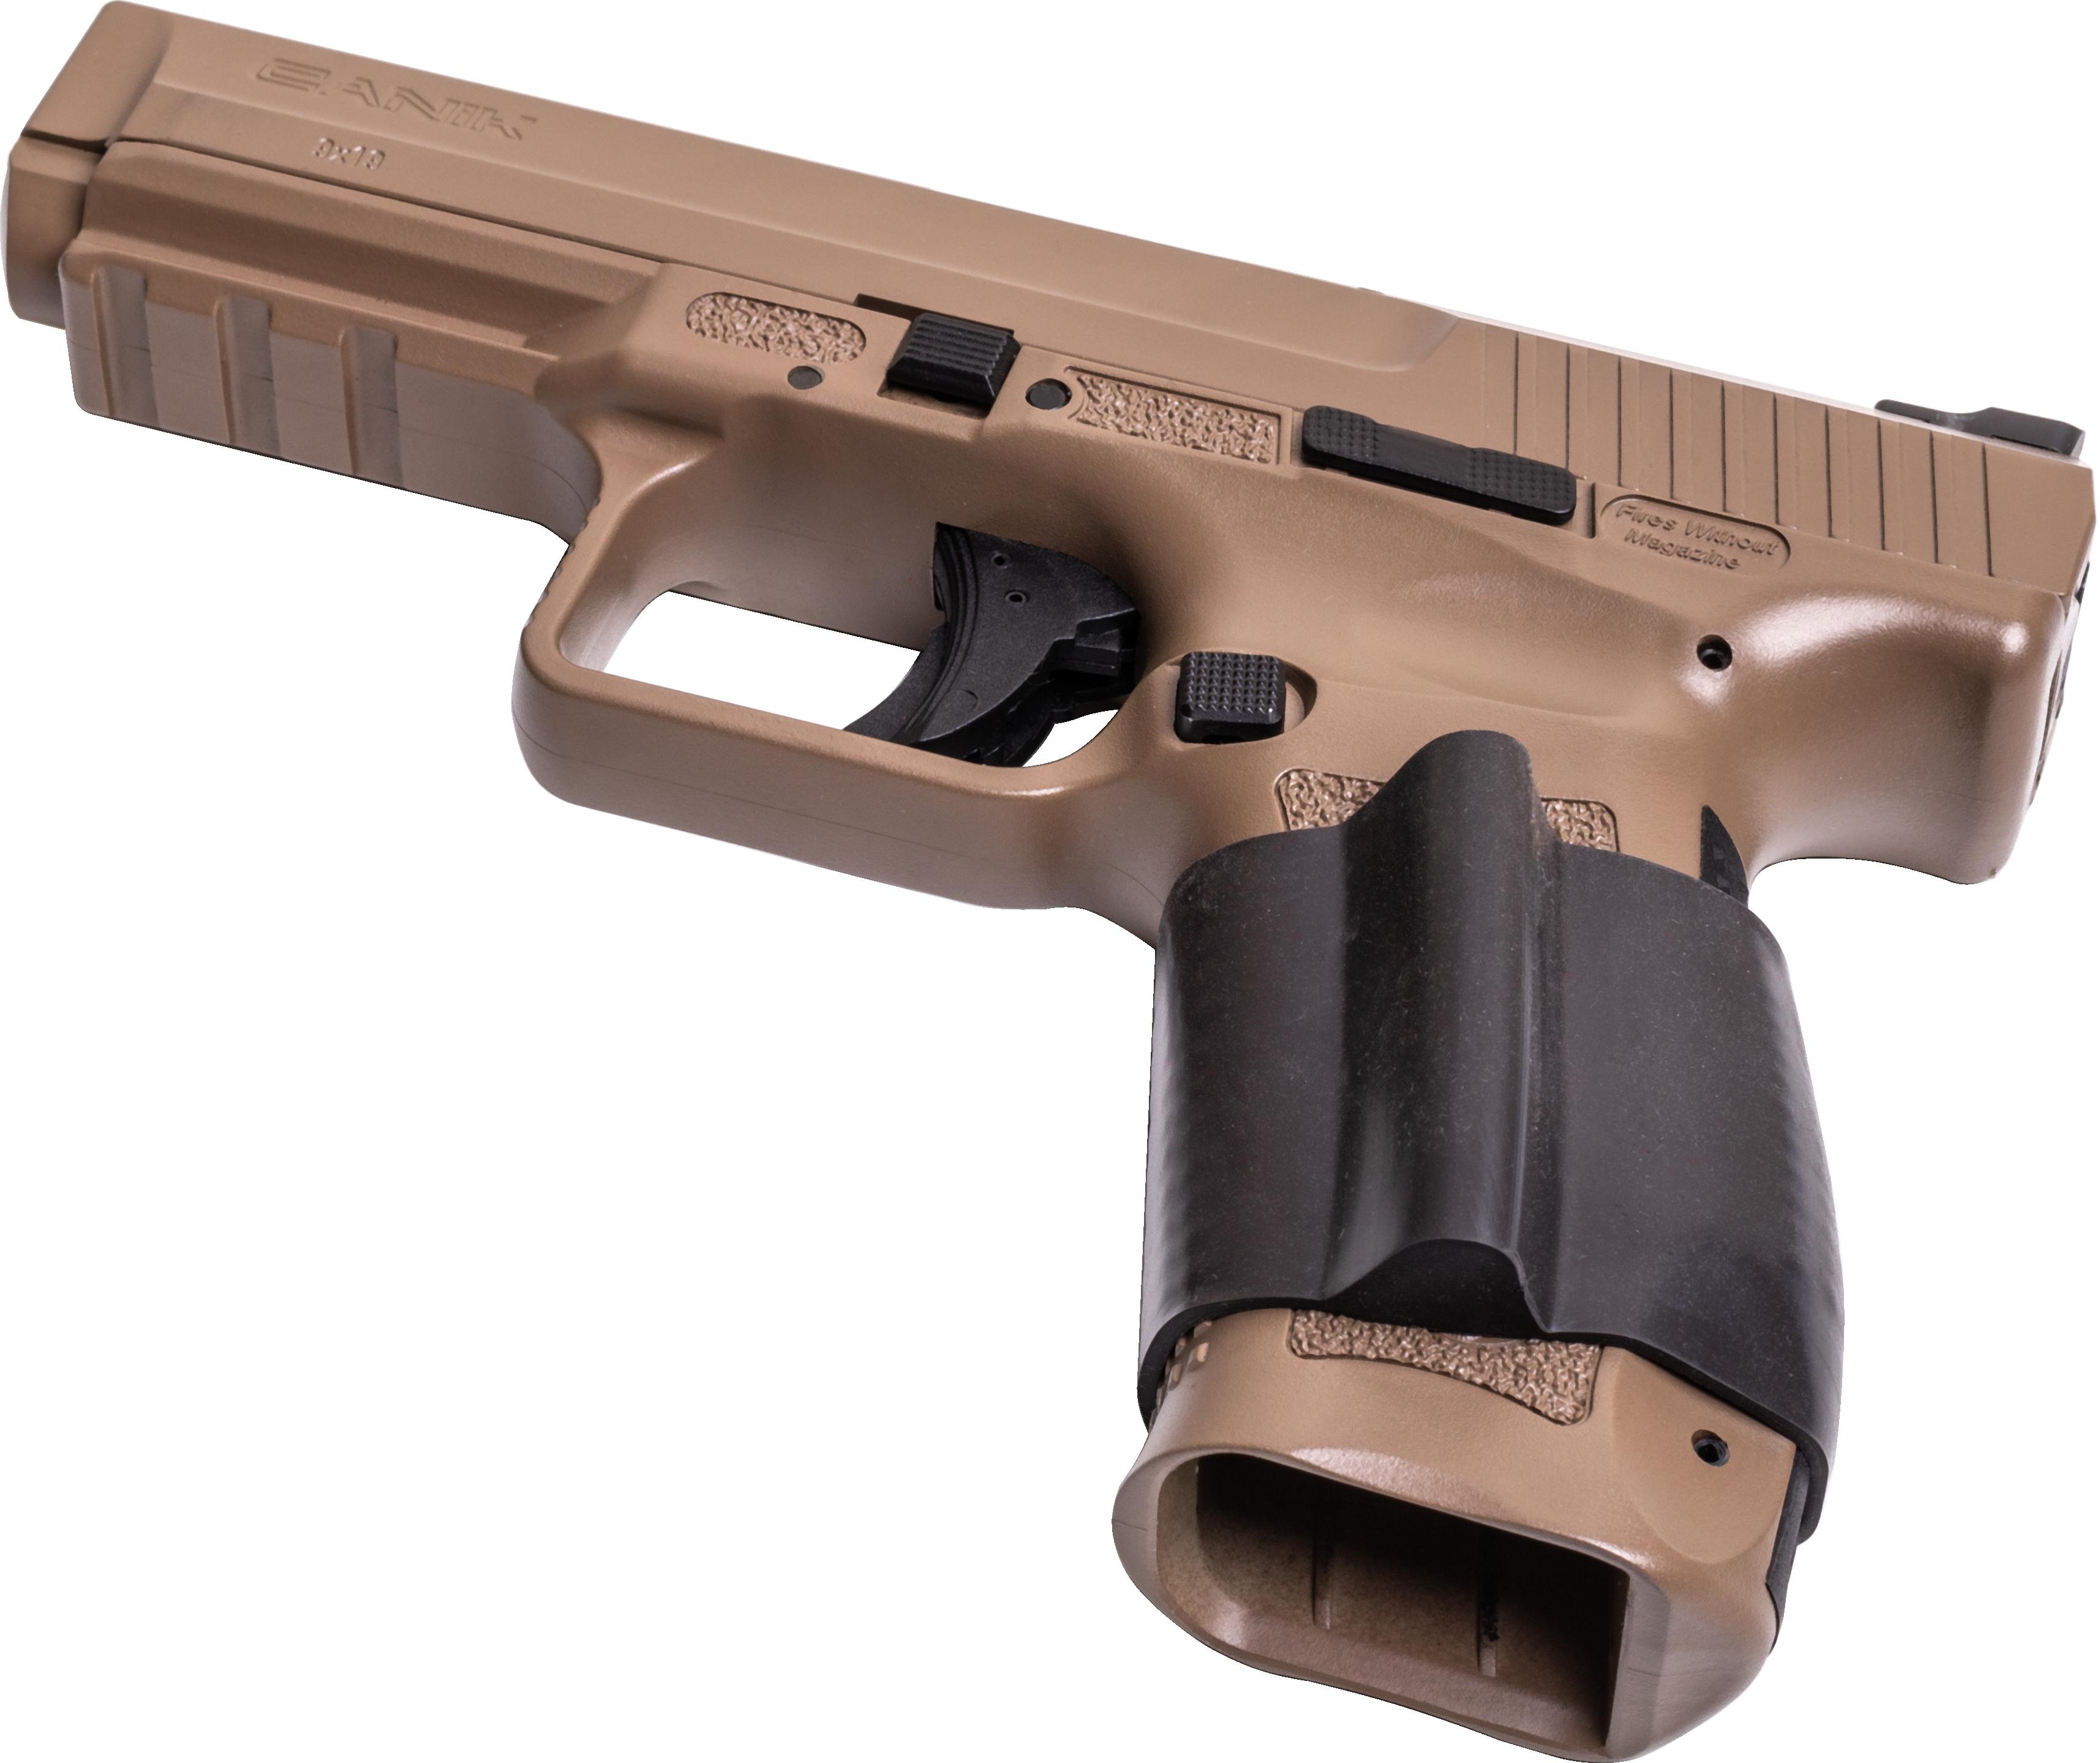 Medium-Large Frame Pistols - Support Hand Grip Assist Sleeve